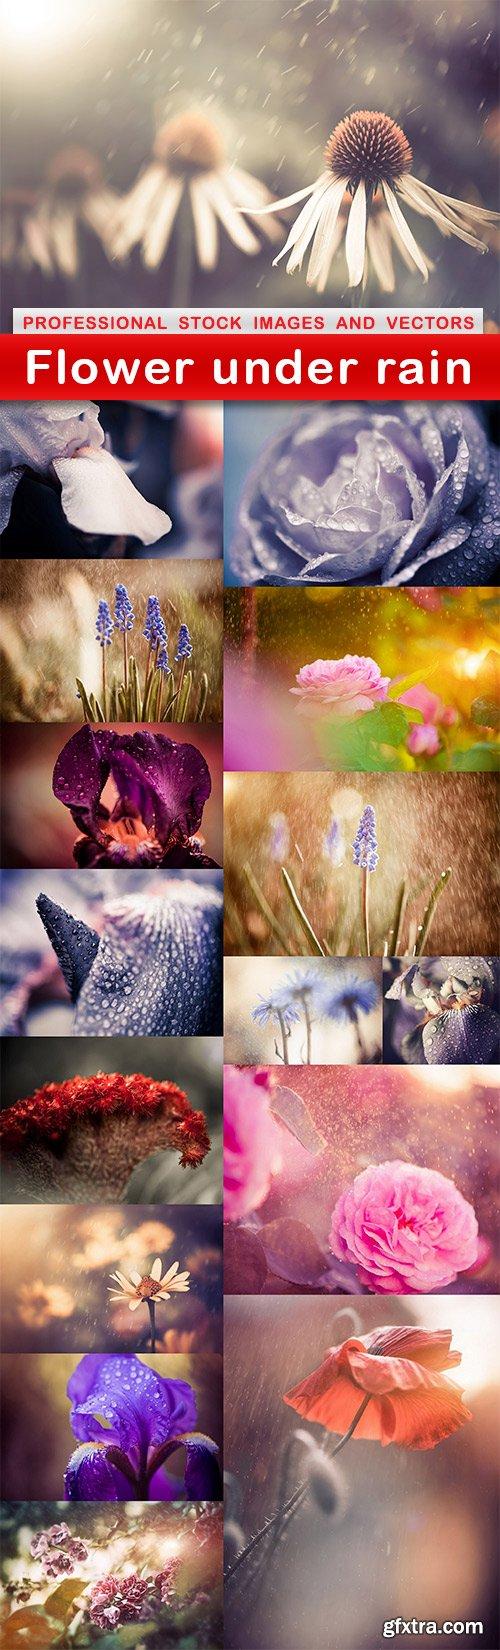 Flower under rain - 16 UHQ JPEG